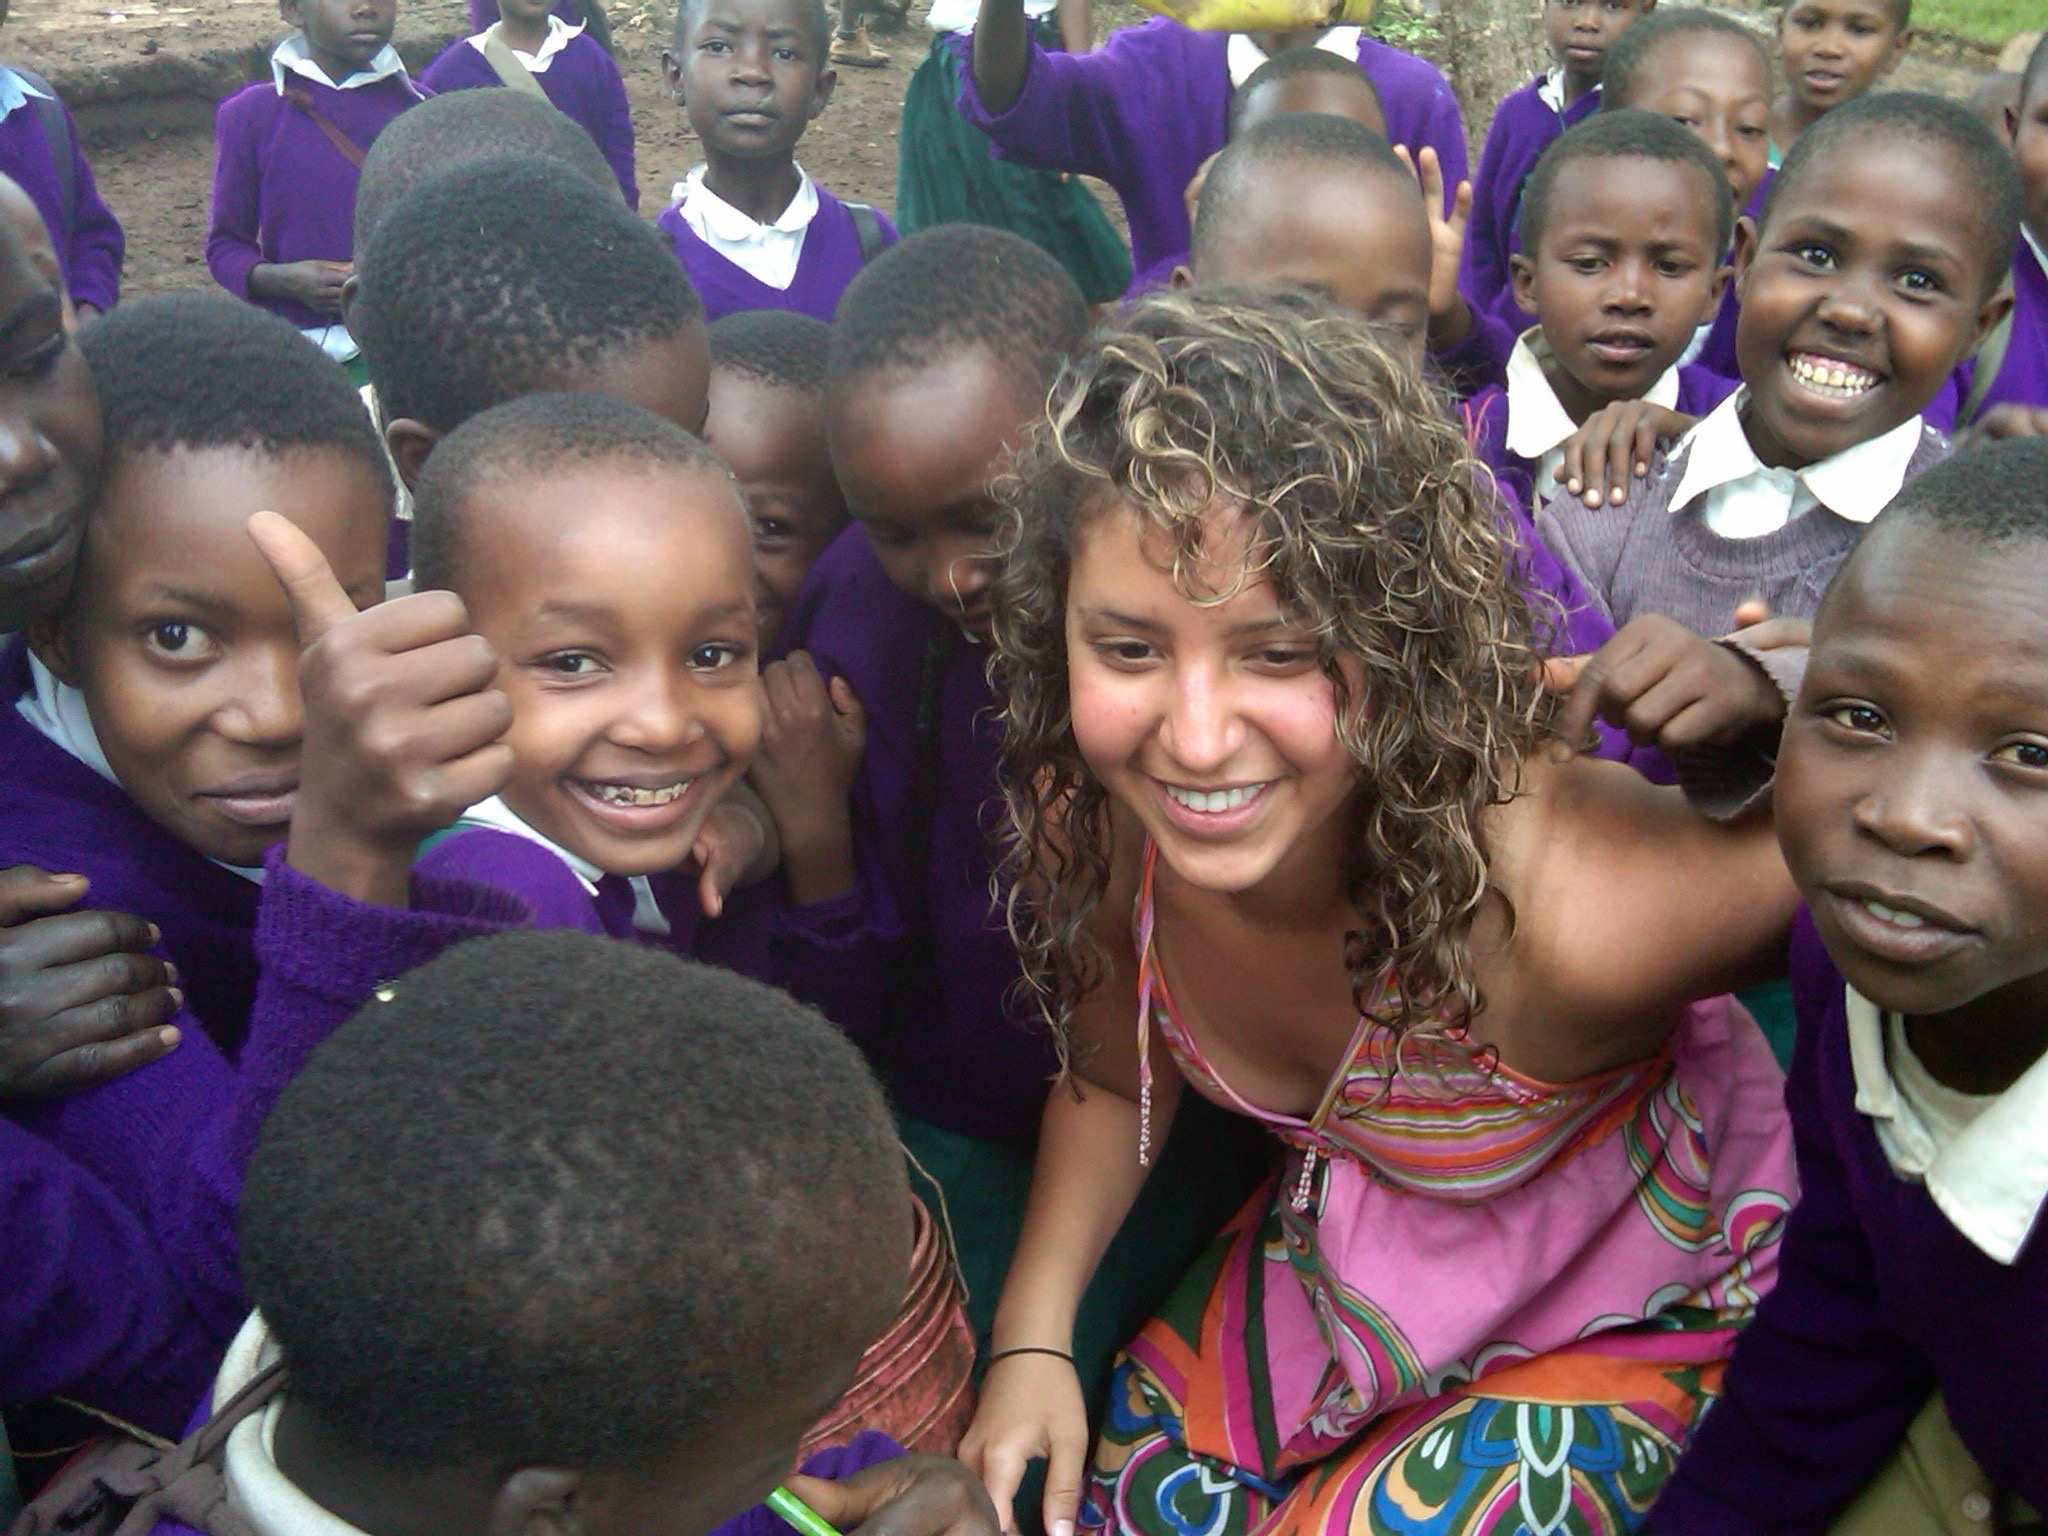 Interacting with the Tanzanian schoolchildren